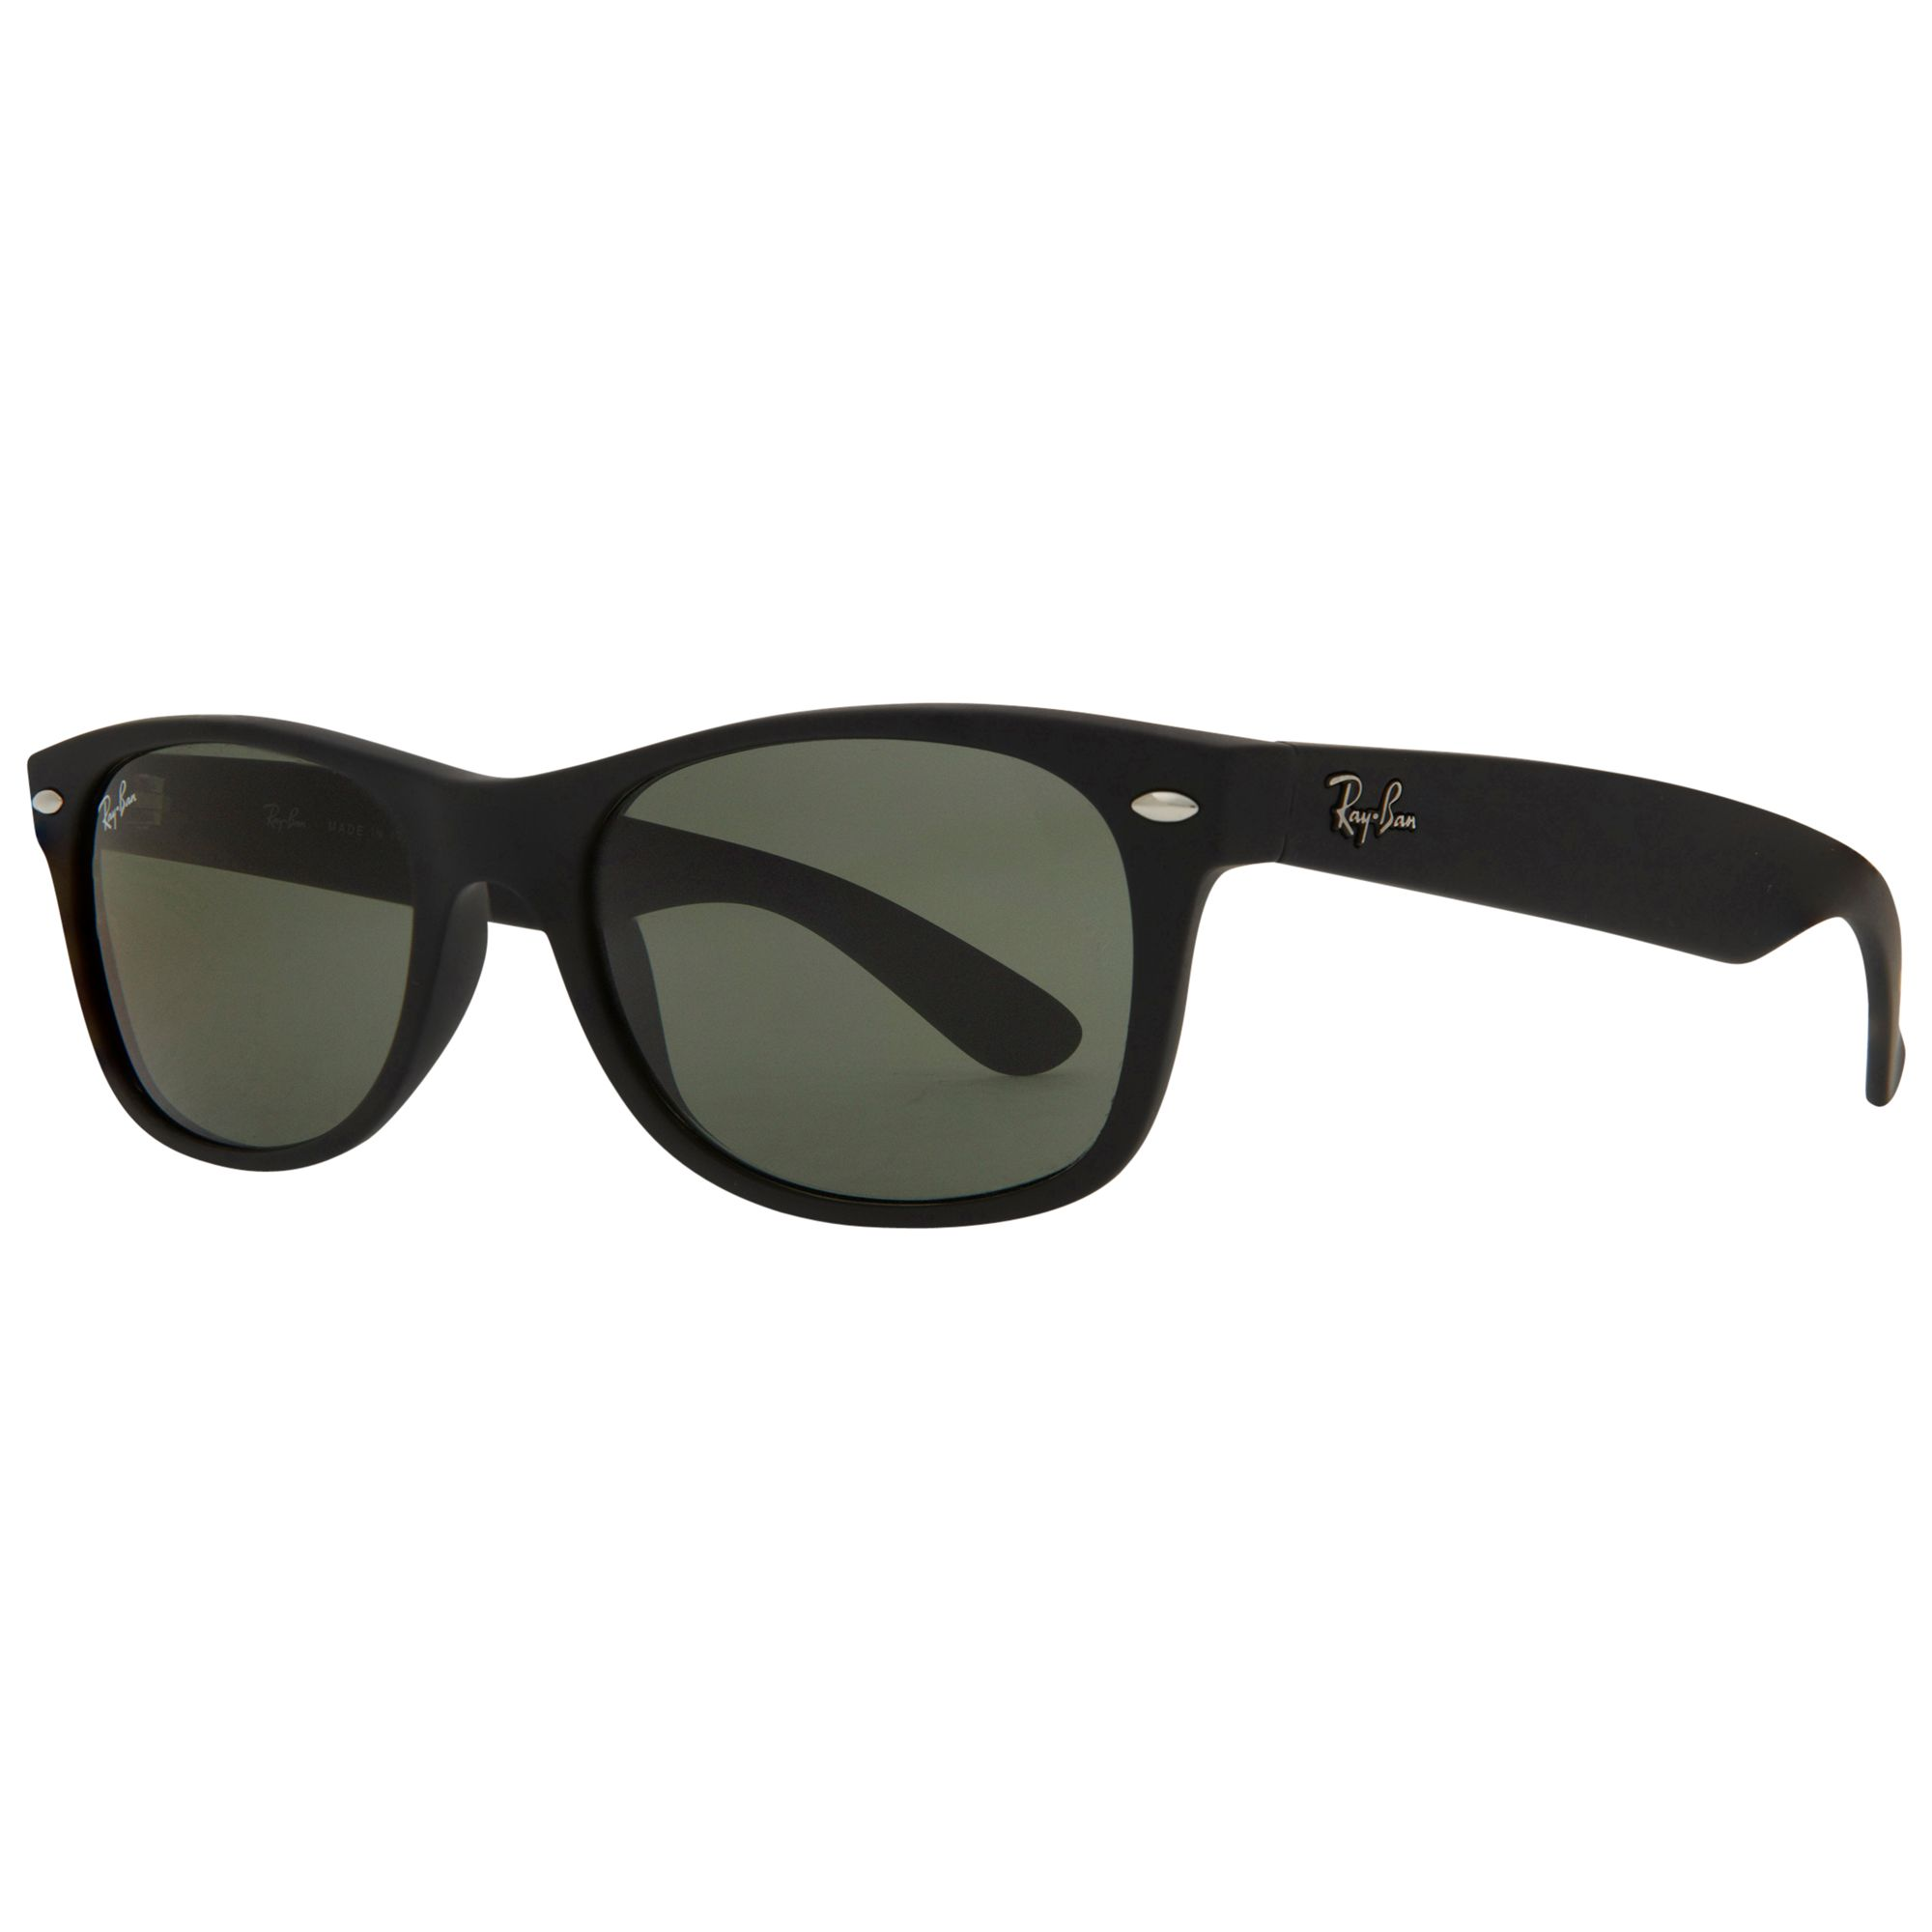 Ray-Ban RB2132 New Wayfarer Sunglasses 64689afd0ac0a